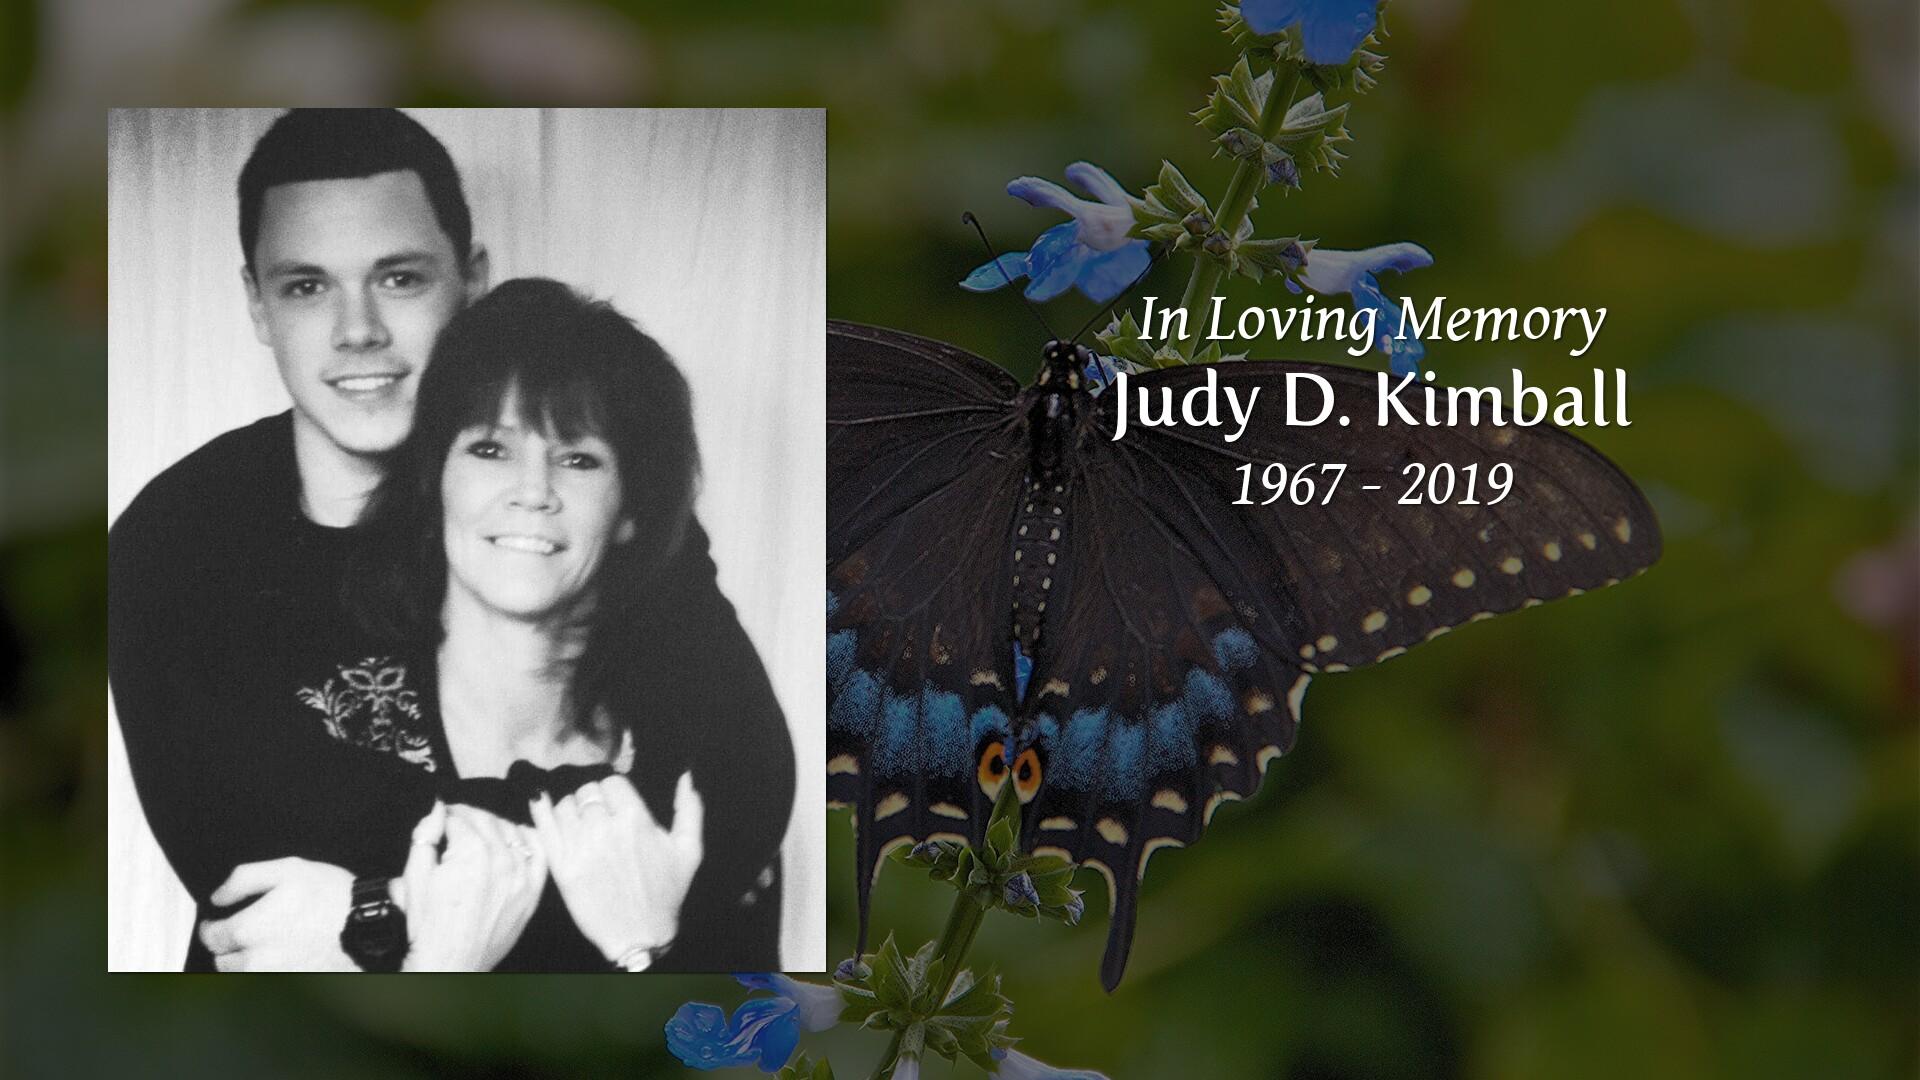 New Comer Family Obituaries - Judy D  Kimball 1967 - 2019